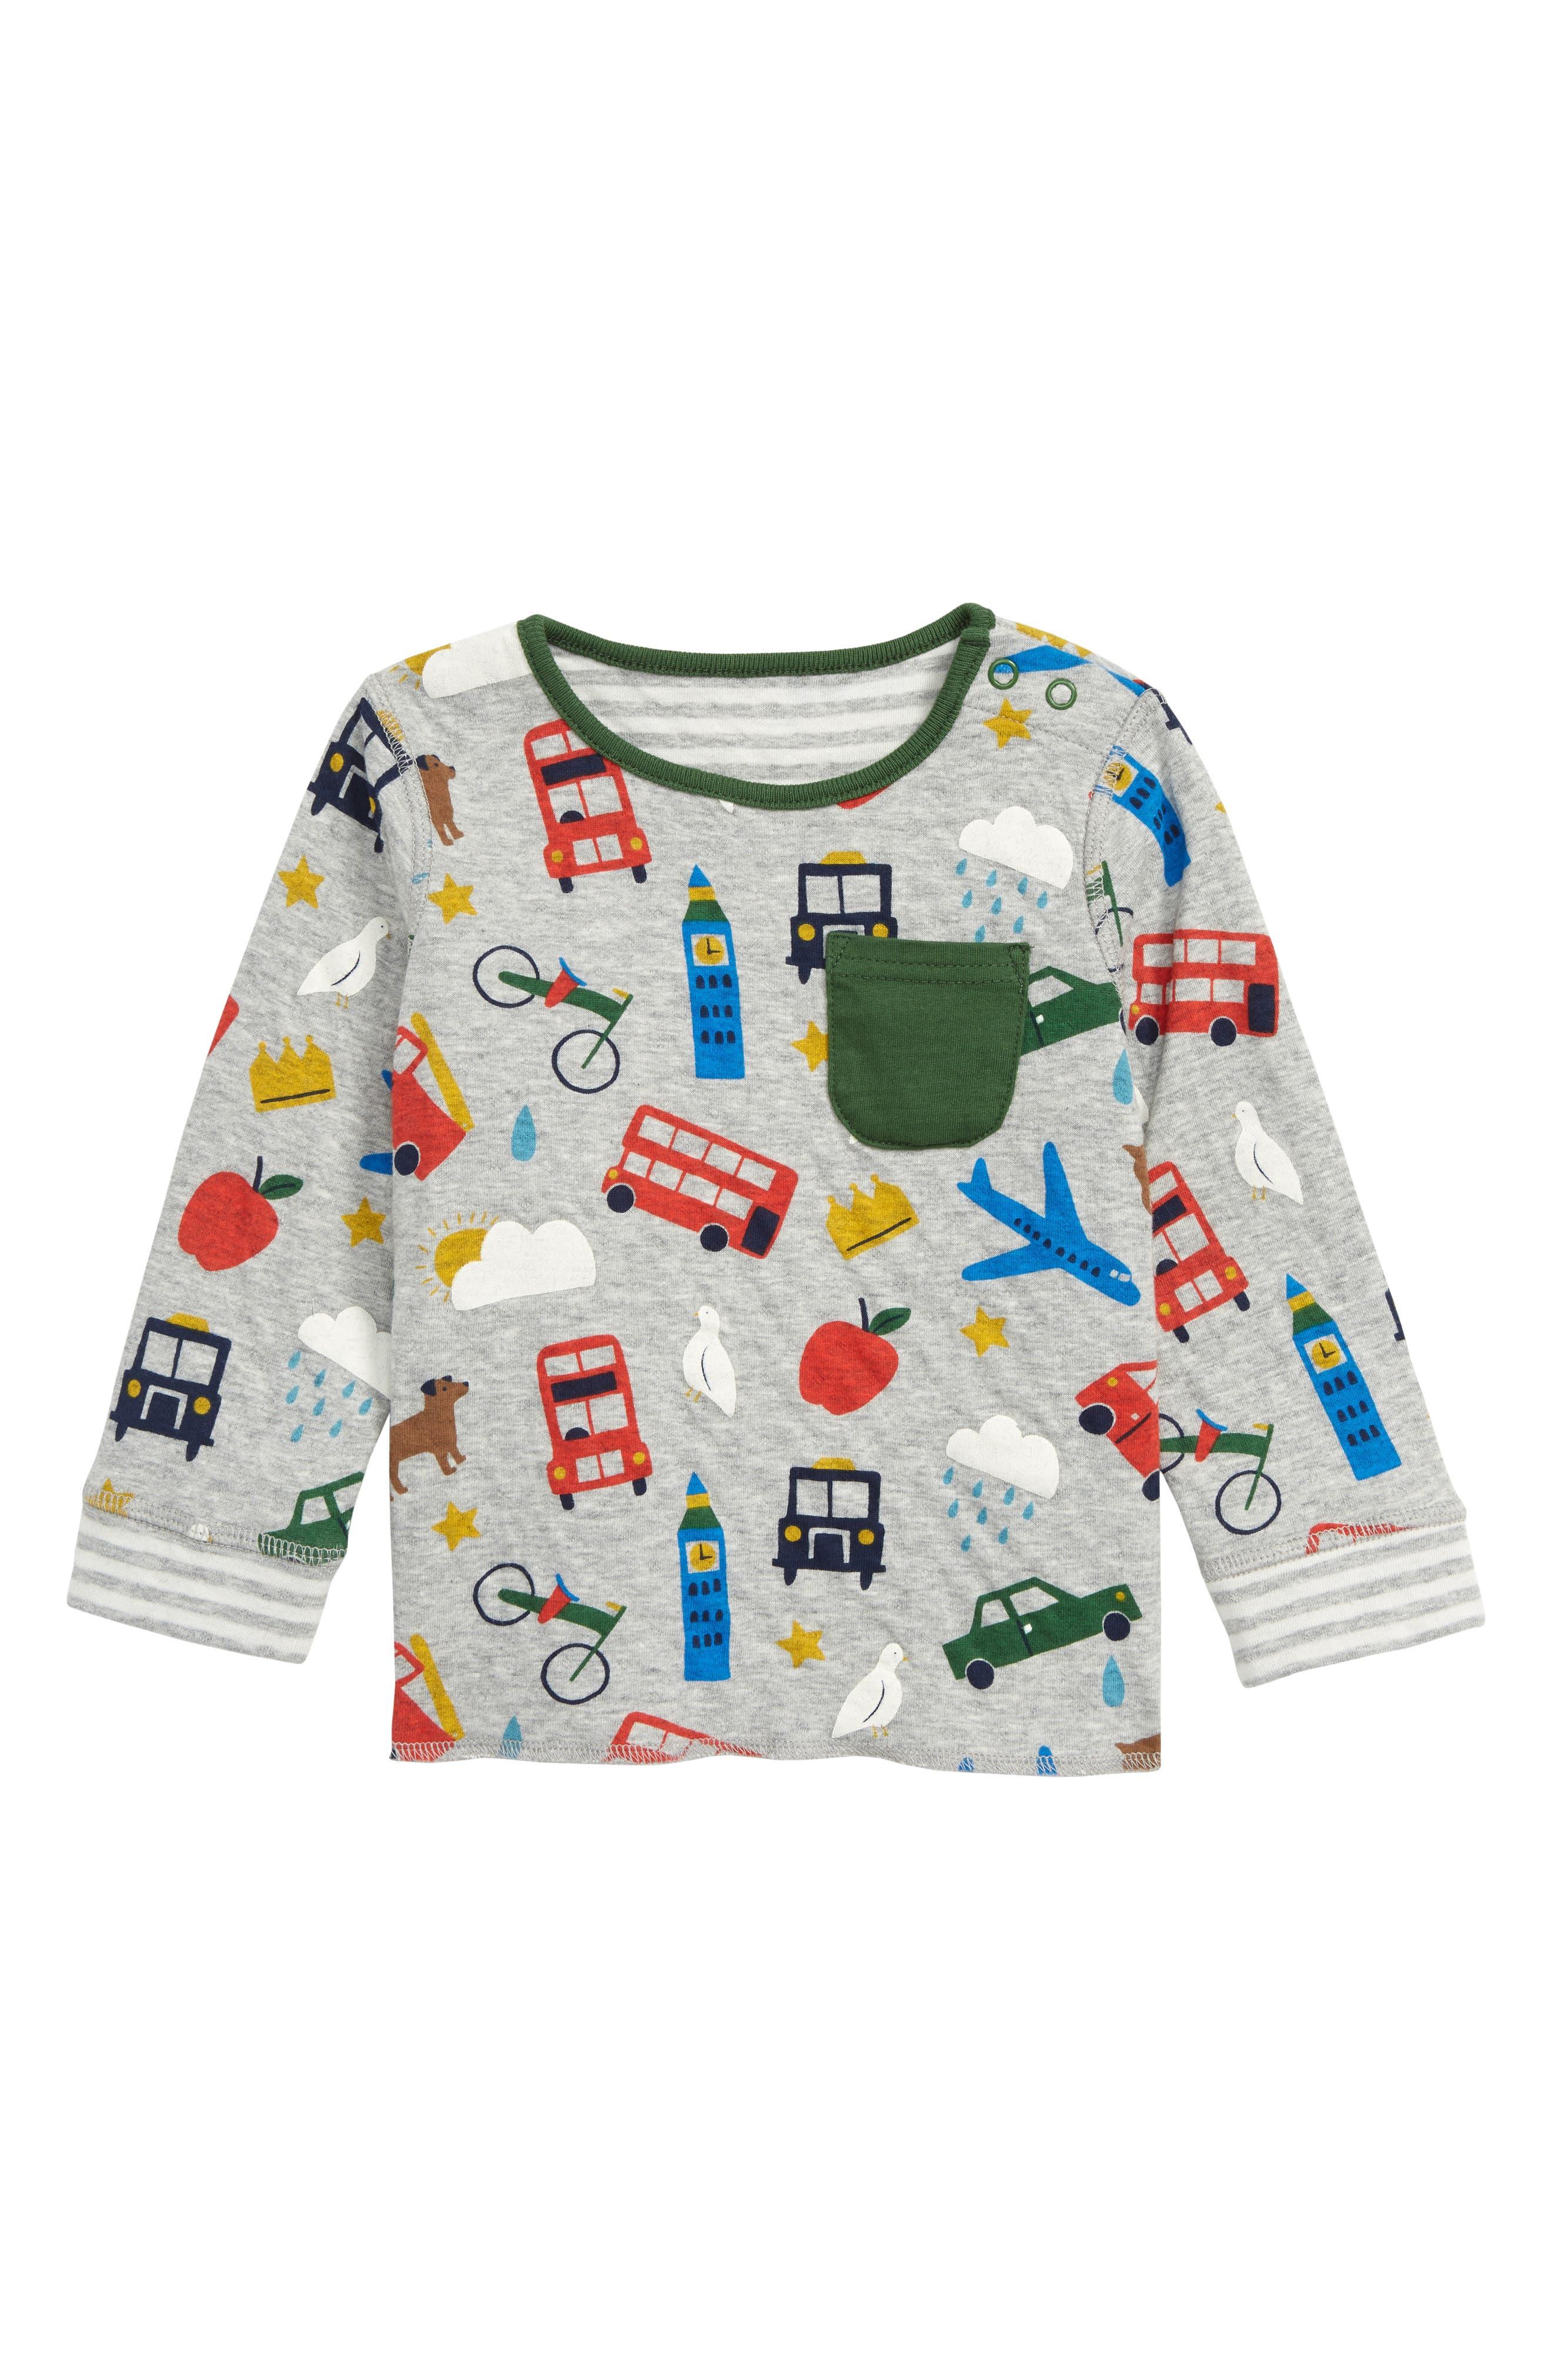 Run Print Reversible T-Shirt, Main, color, GRY GREY MARL LONDON BUSTLE